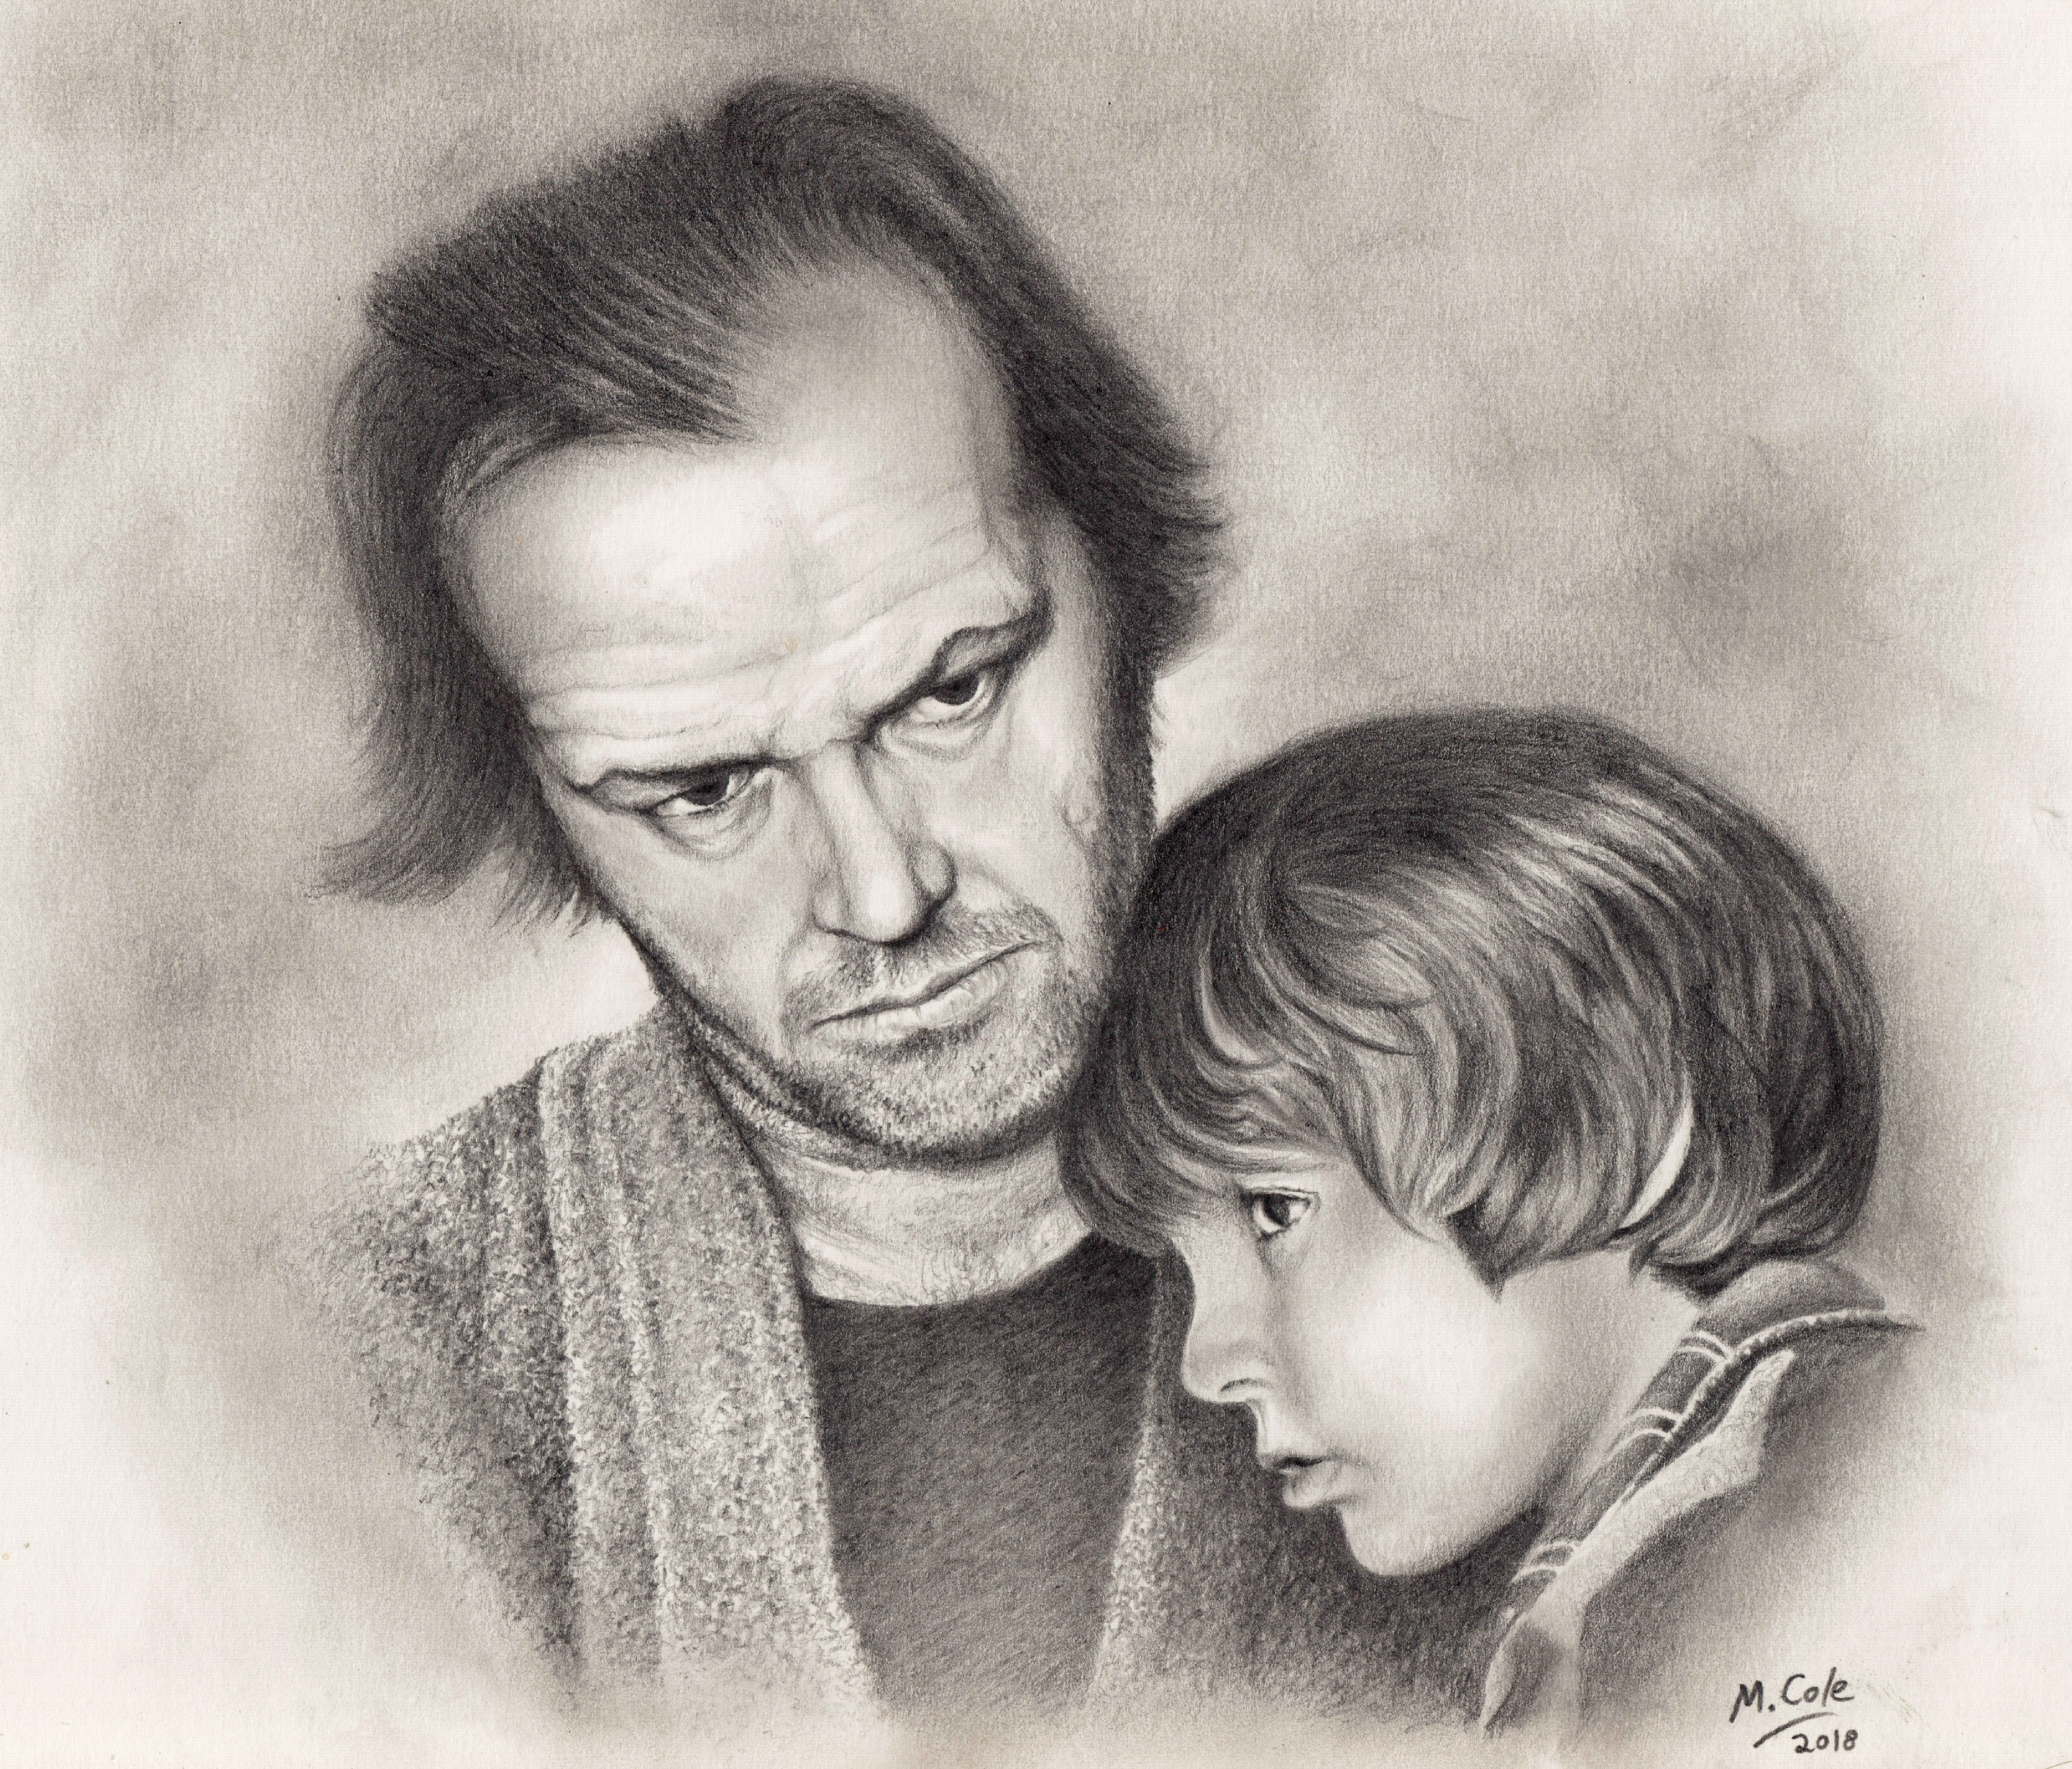 Jack & Danny - The Shining